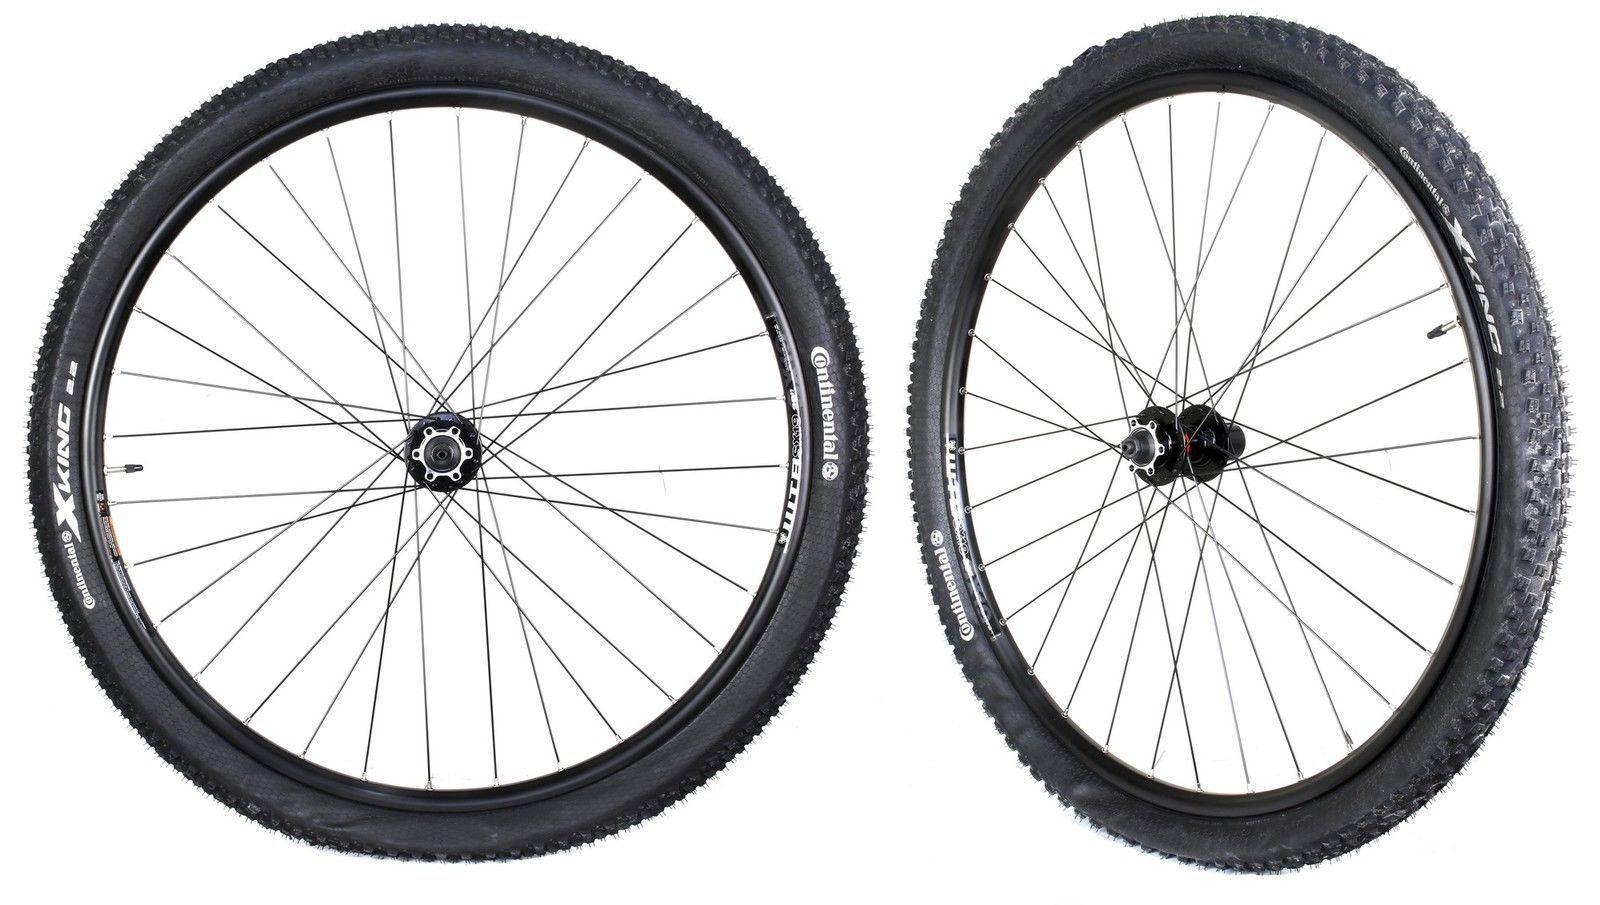 "WTB SX19 Mountain Bike Bicycle Novatec Hubs /& Tires Wheelset 11s 29/"" QR"